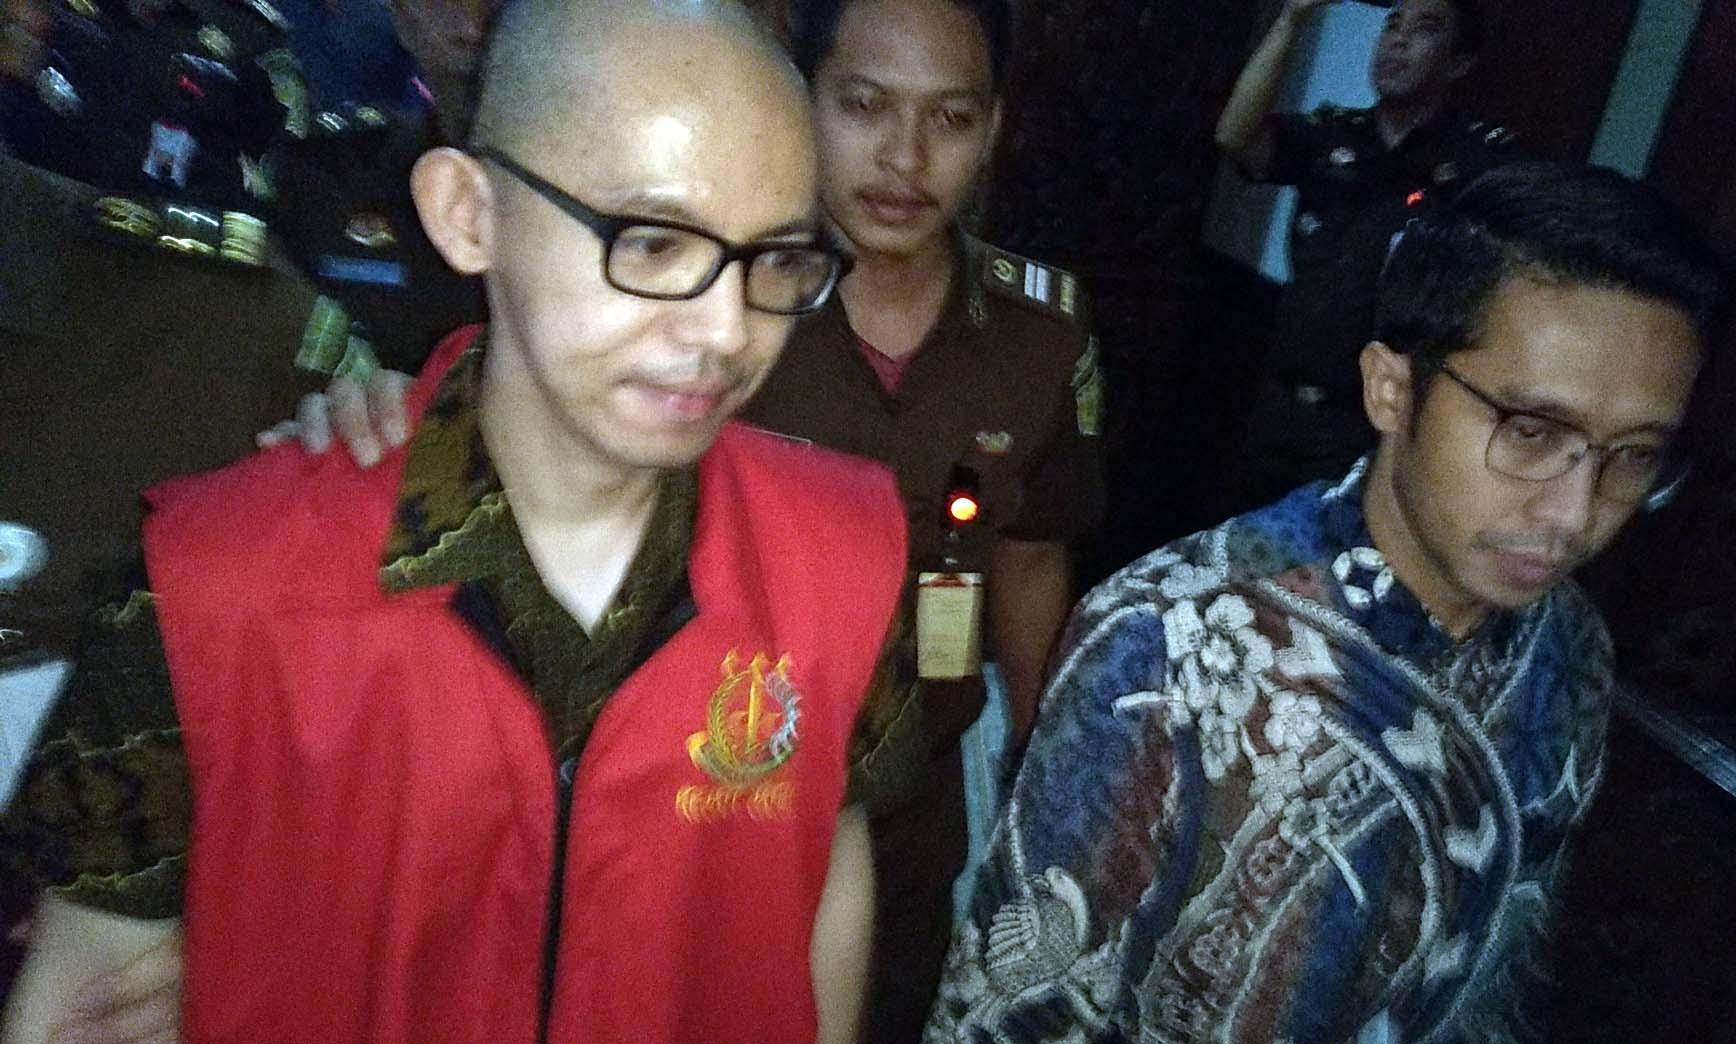 Pekan Depan, Berkas Korupsi PT DPS Dilimpahkan ke Pengadilan